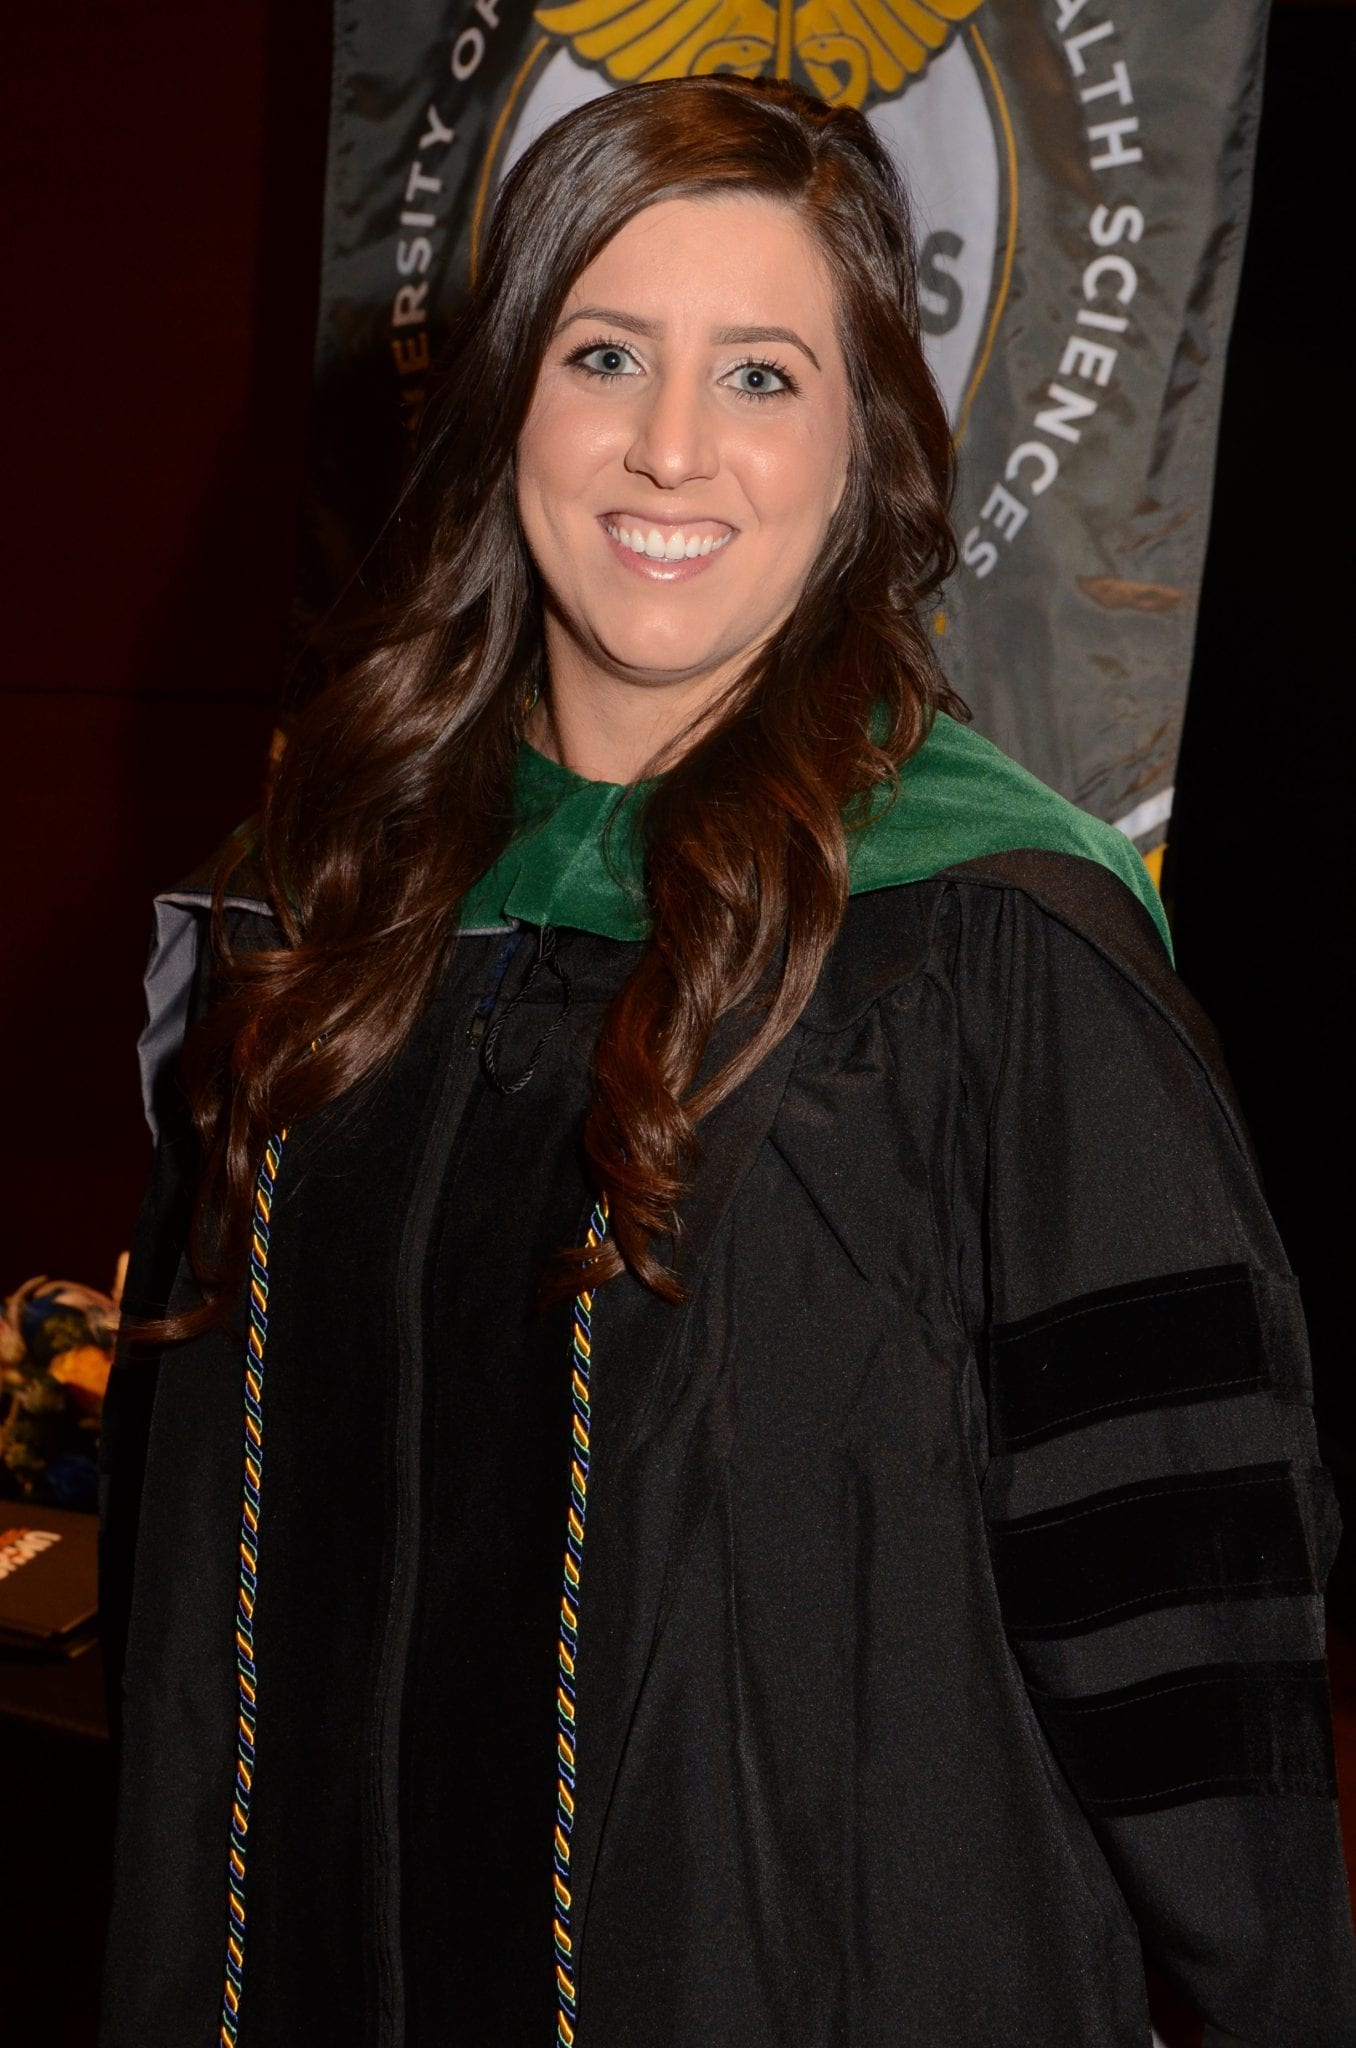 Mikayla-Troughton-graduation